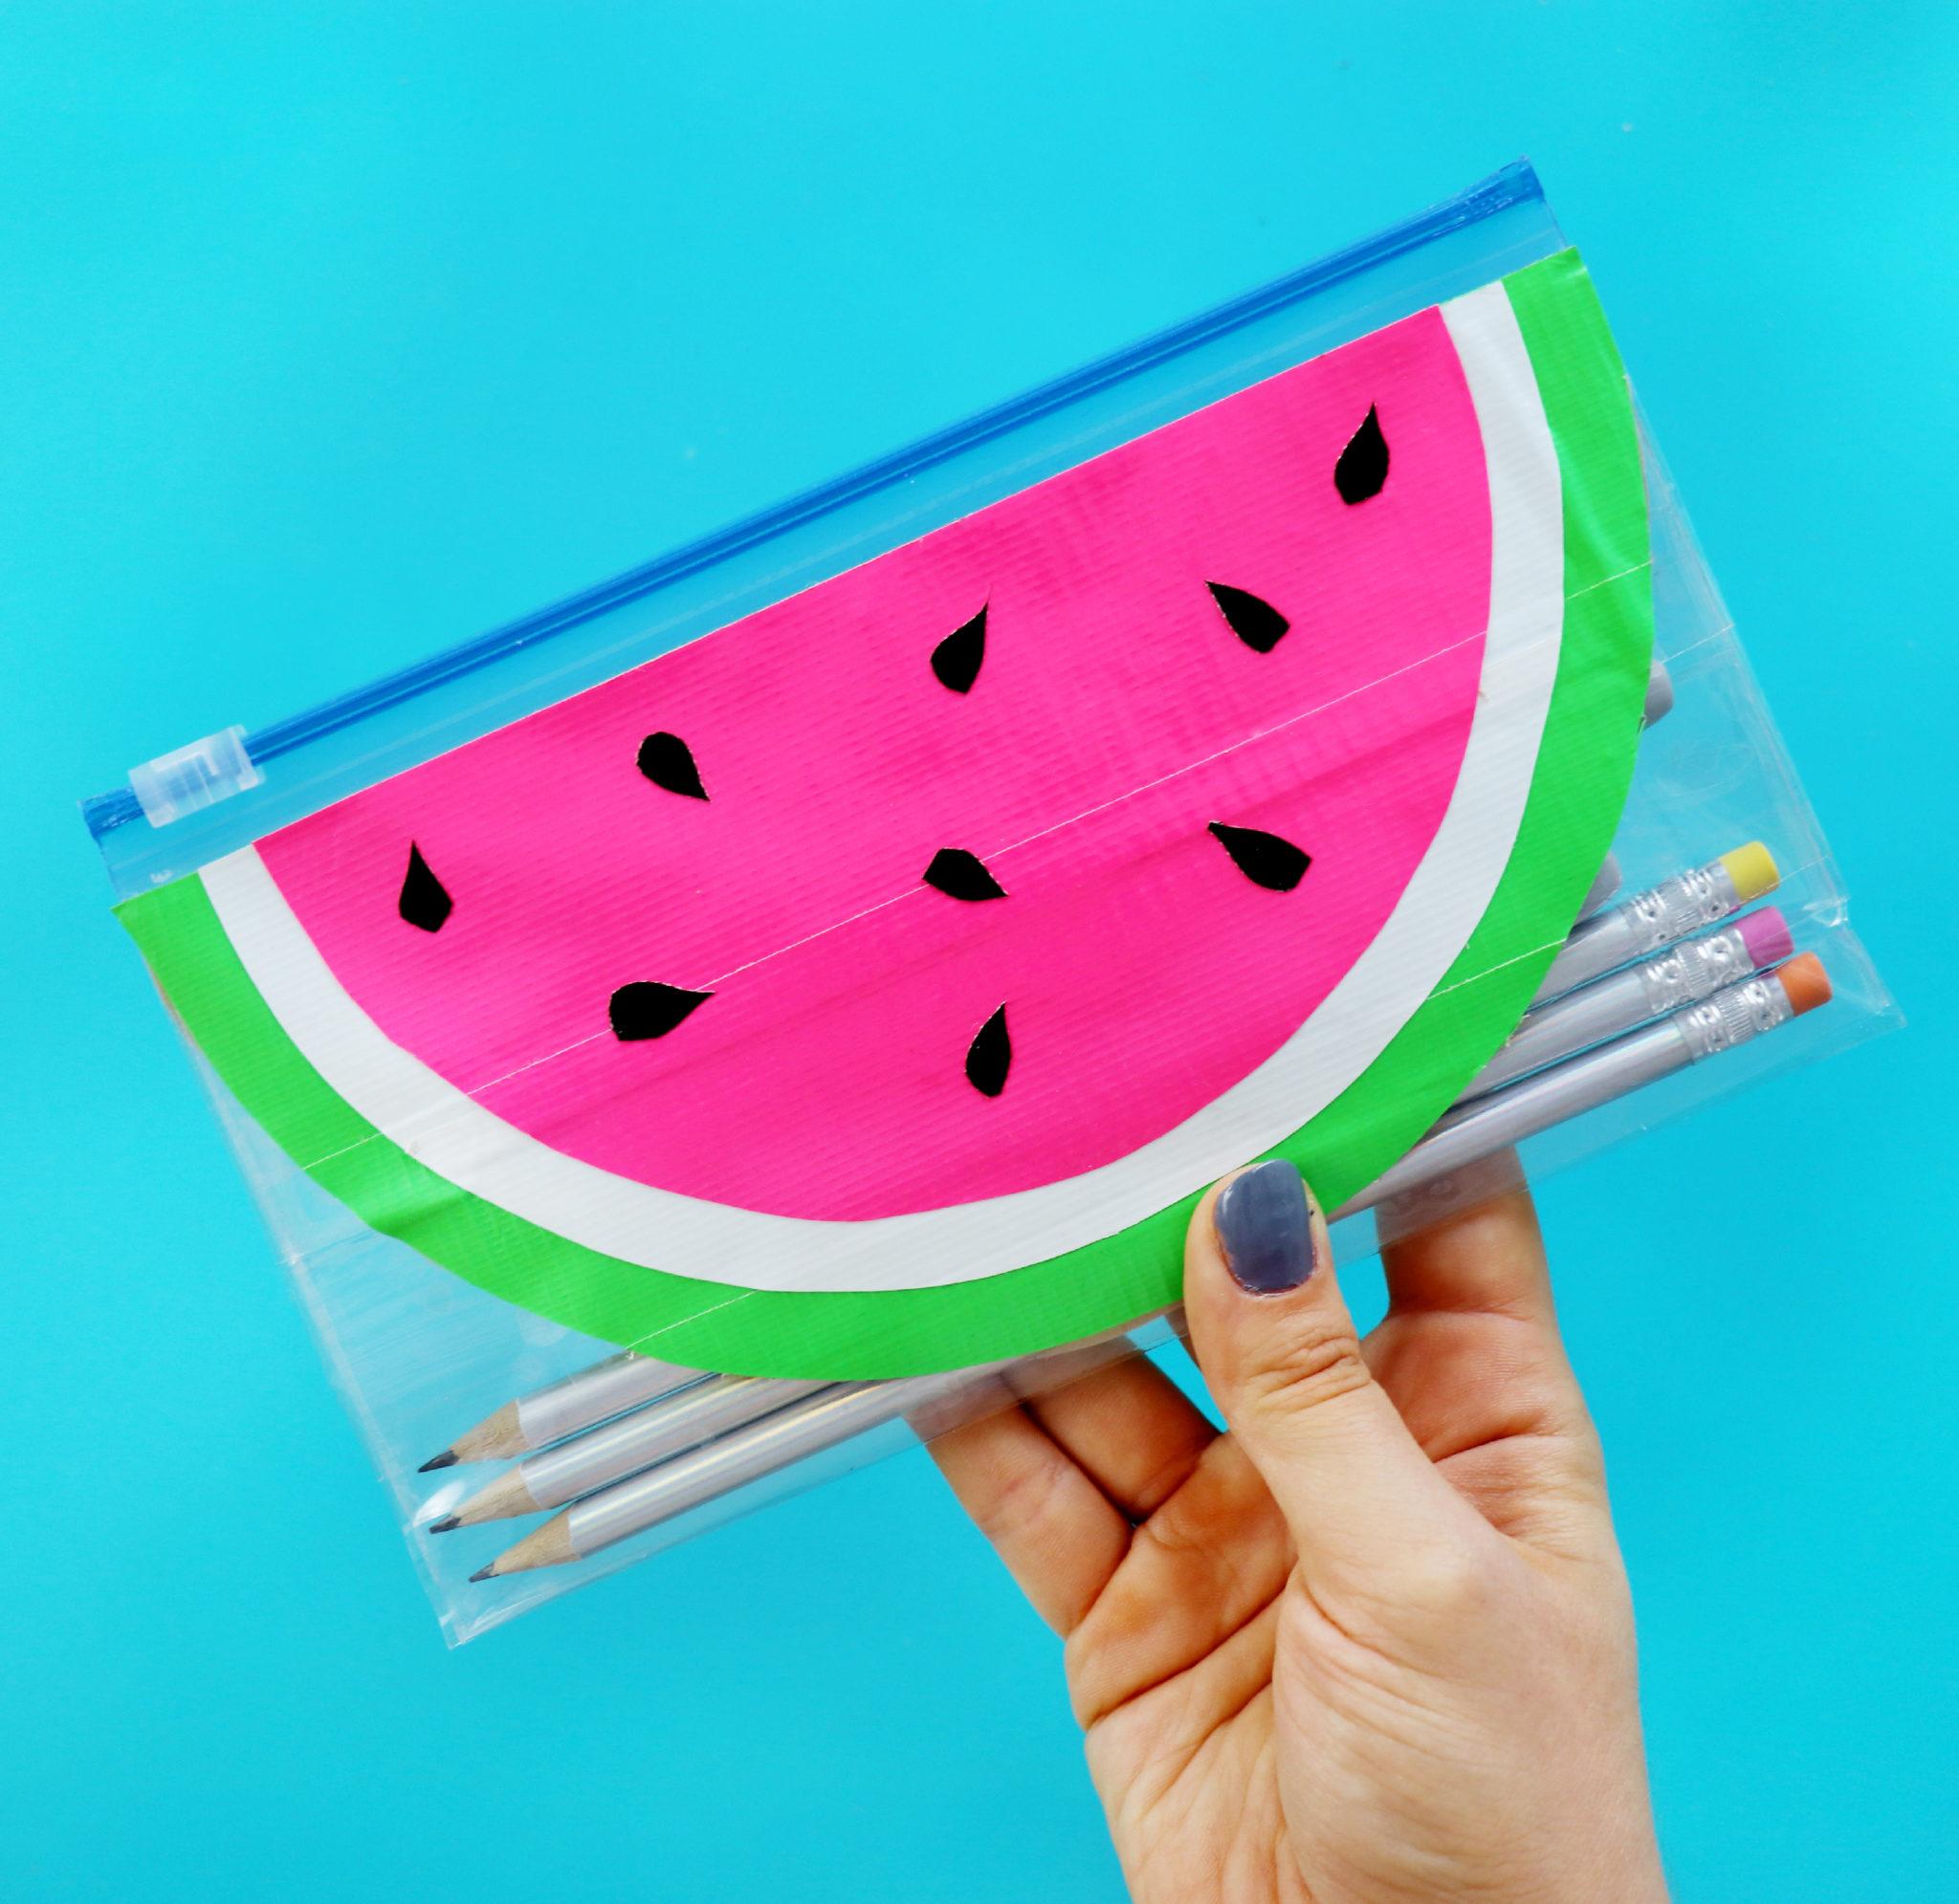 watermelon_held